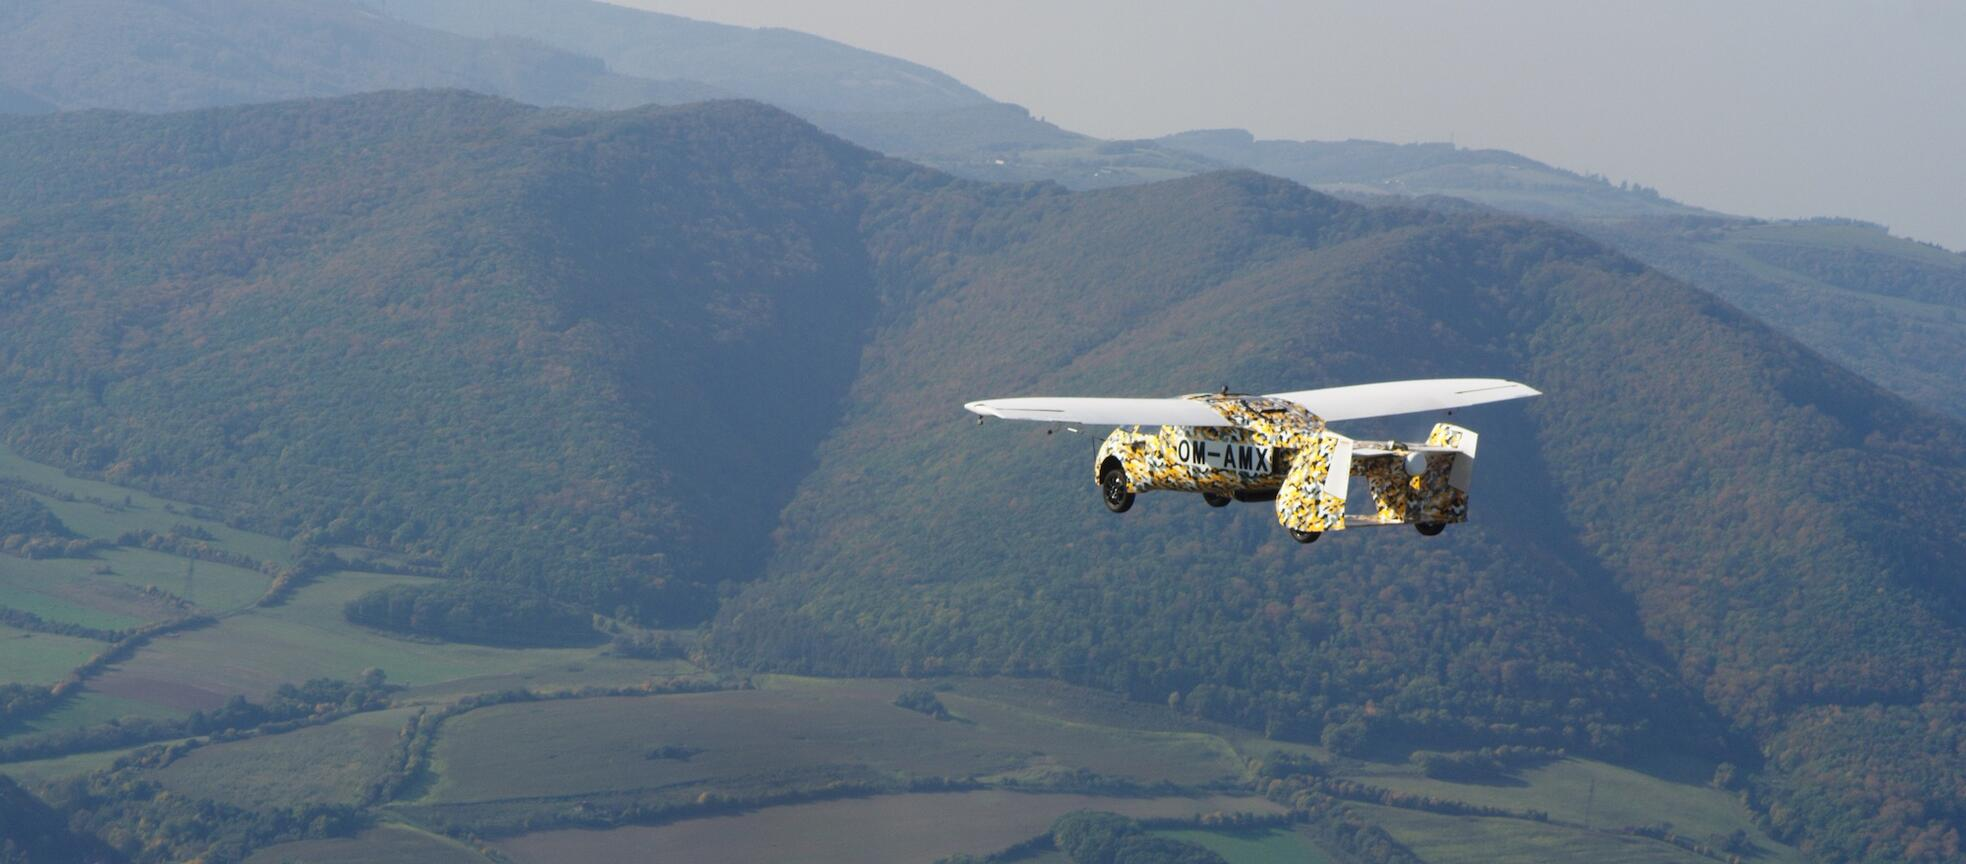 the AeroMobil takes flight